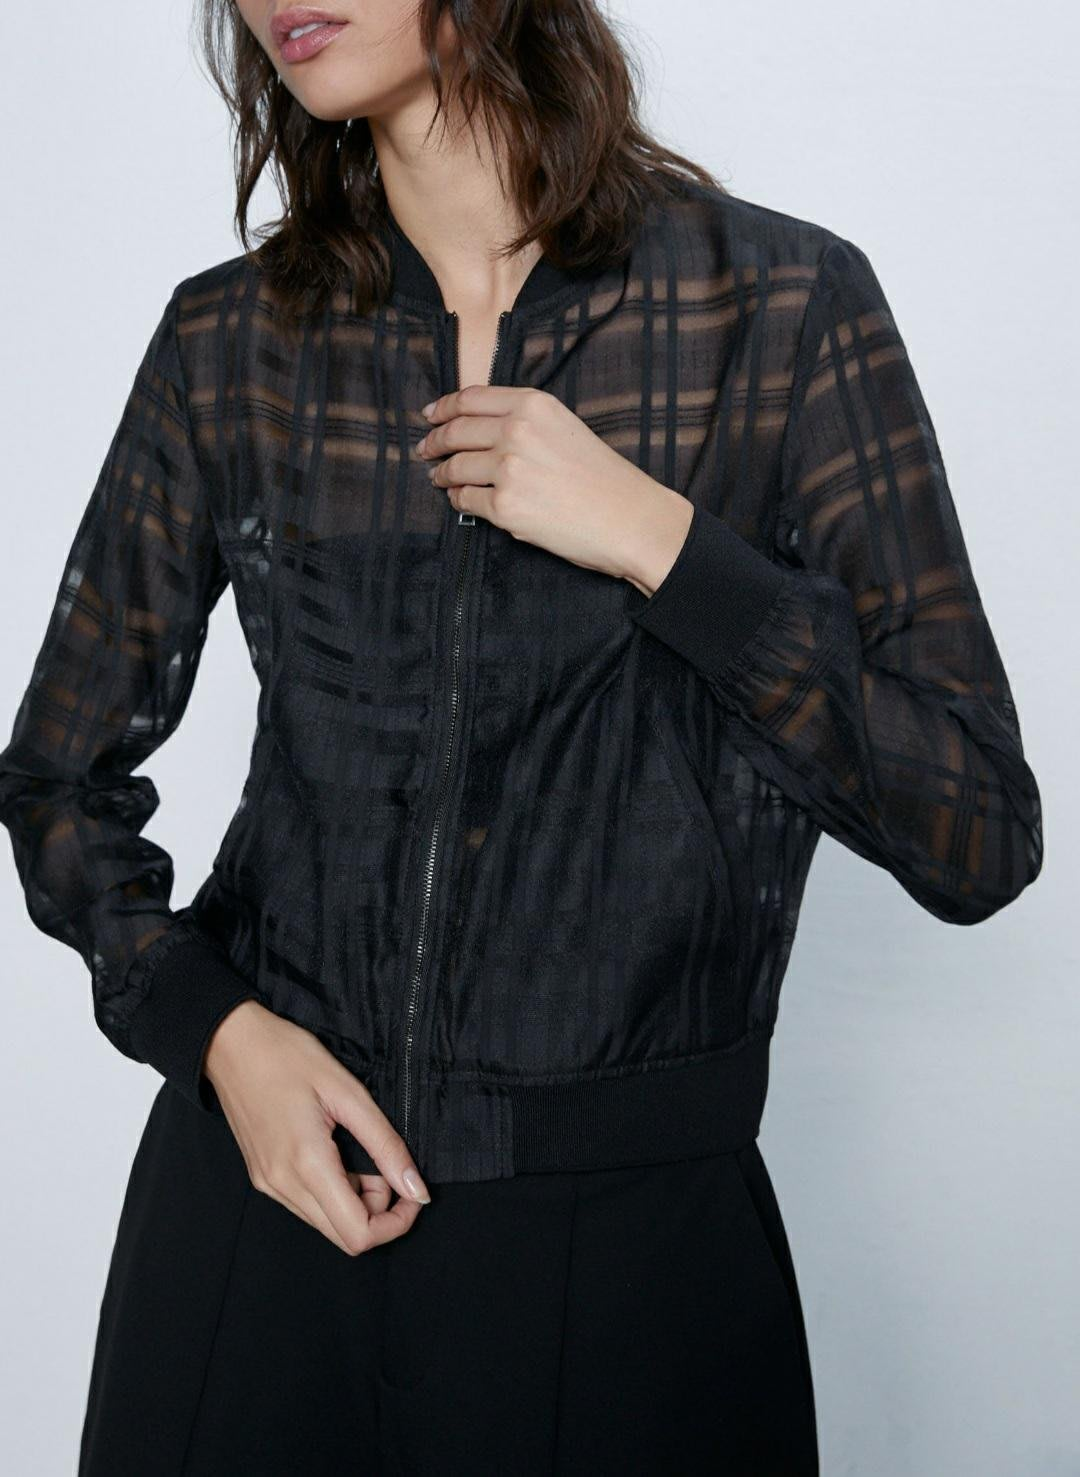 ZARA新款透明硬紗飛行員外套,XL合身版#現貨